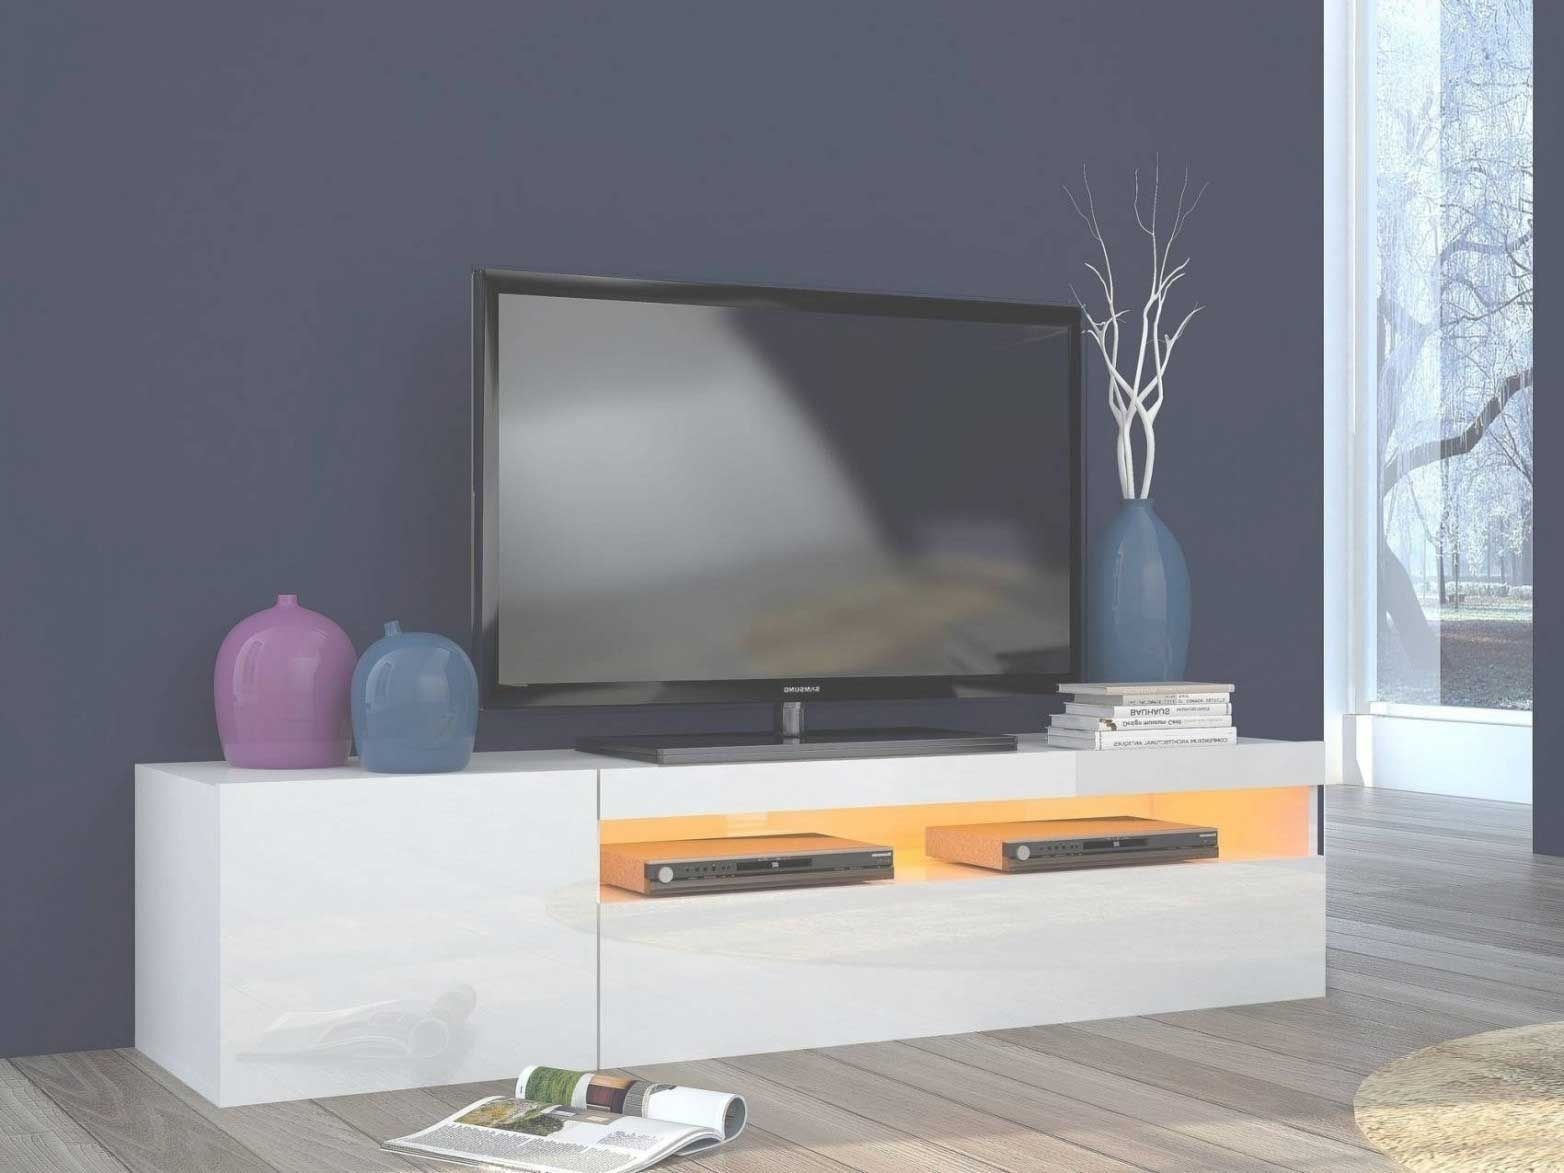 Meuble Tv Suspendu Blanc Et Bois Meuble Tv Suspendu Design